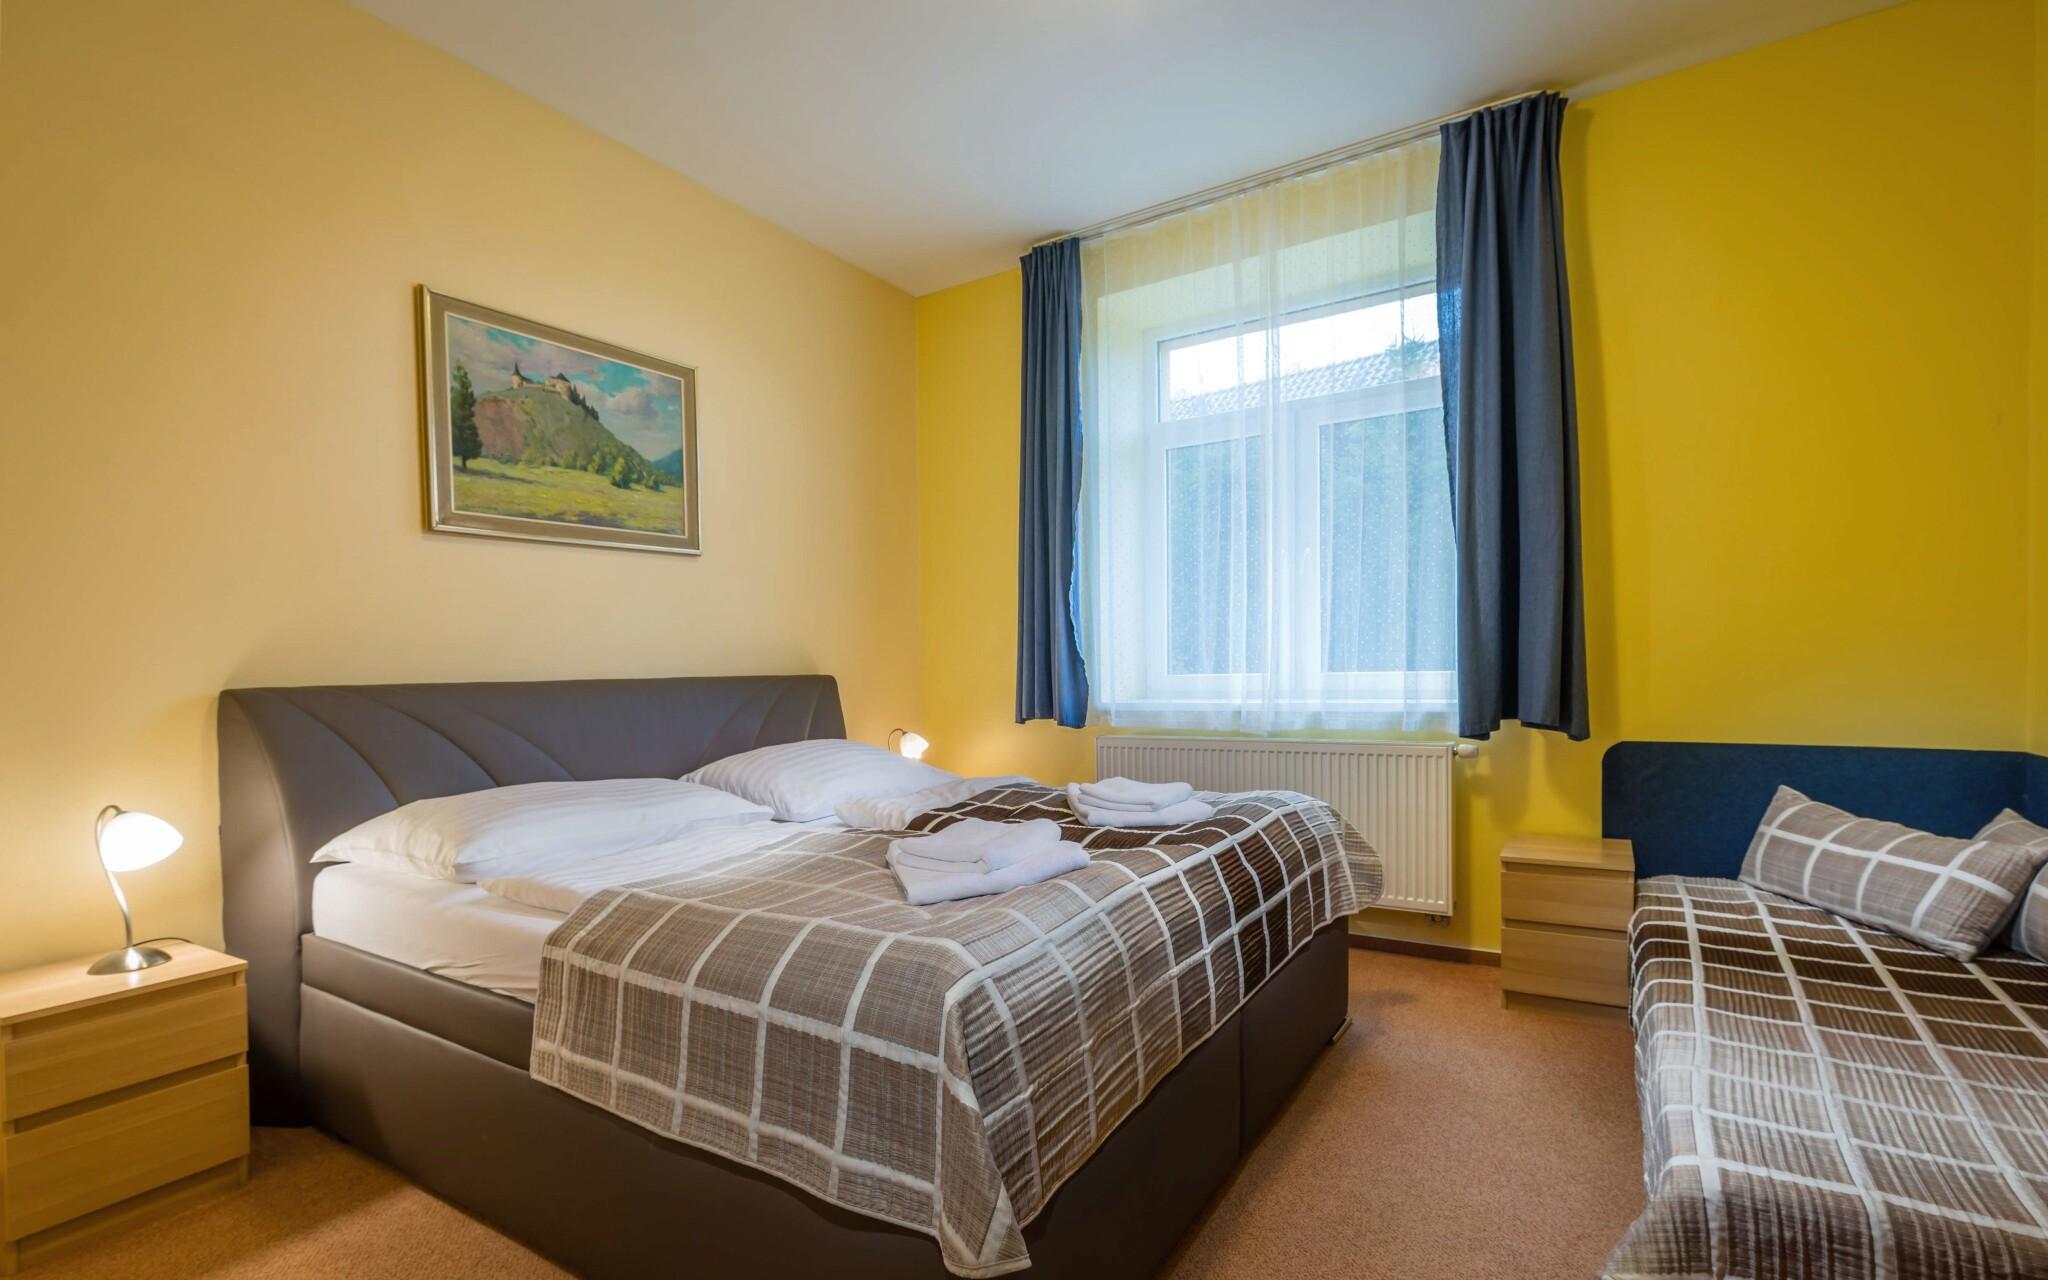 Bezbariérový apartmán až pro 5 osob, ložnice